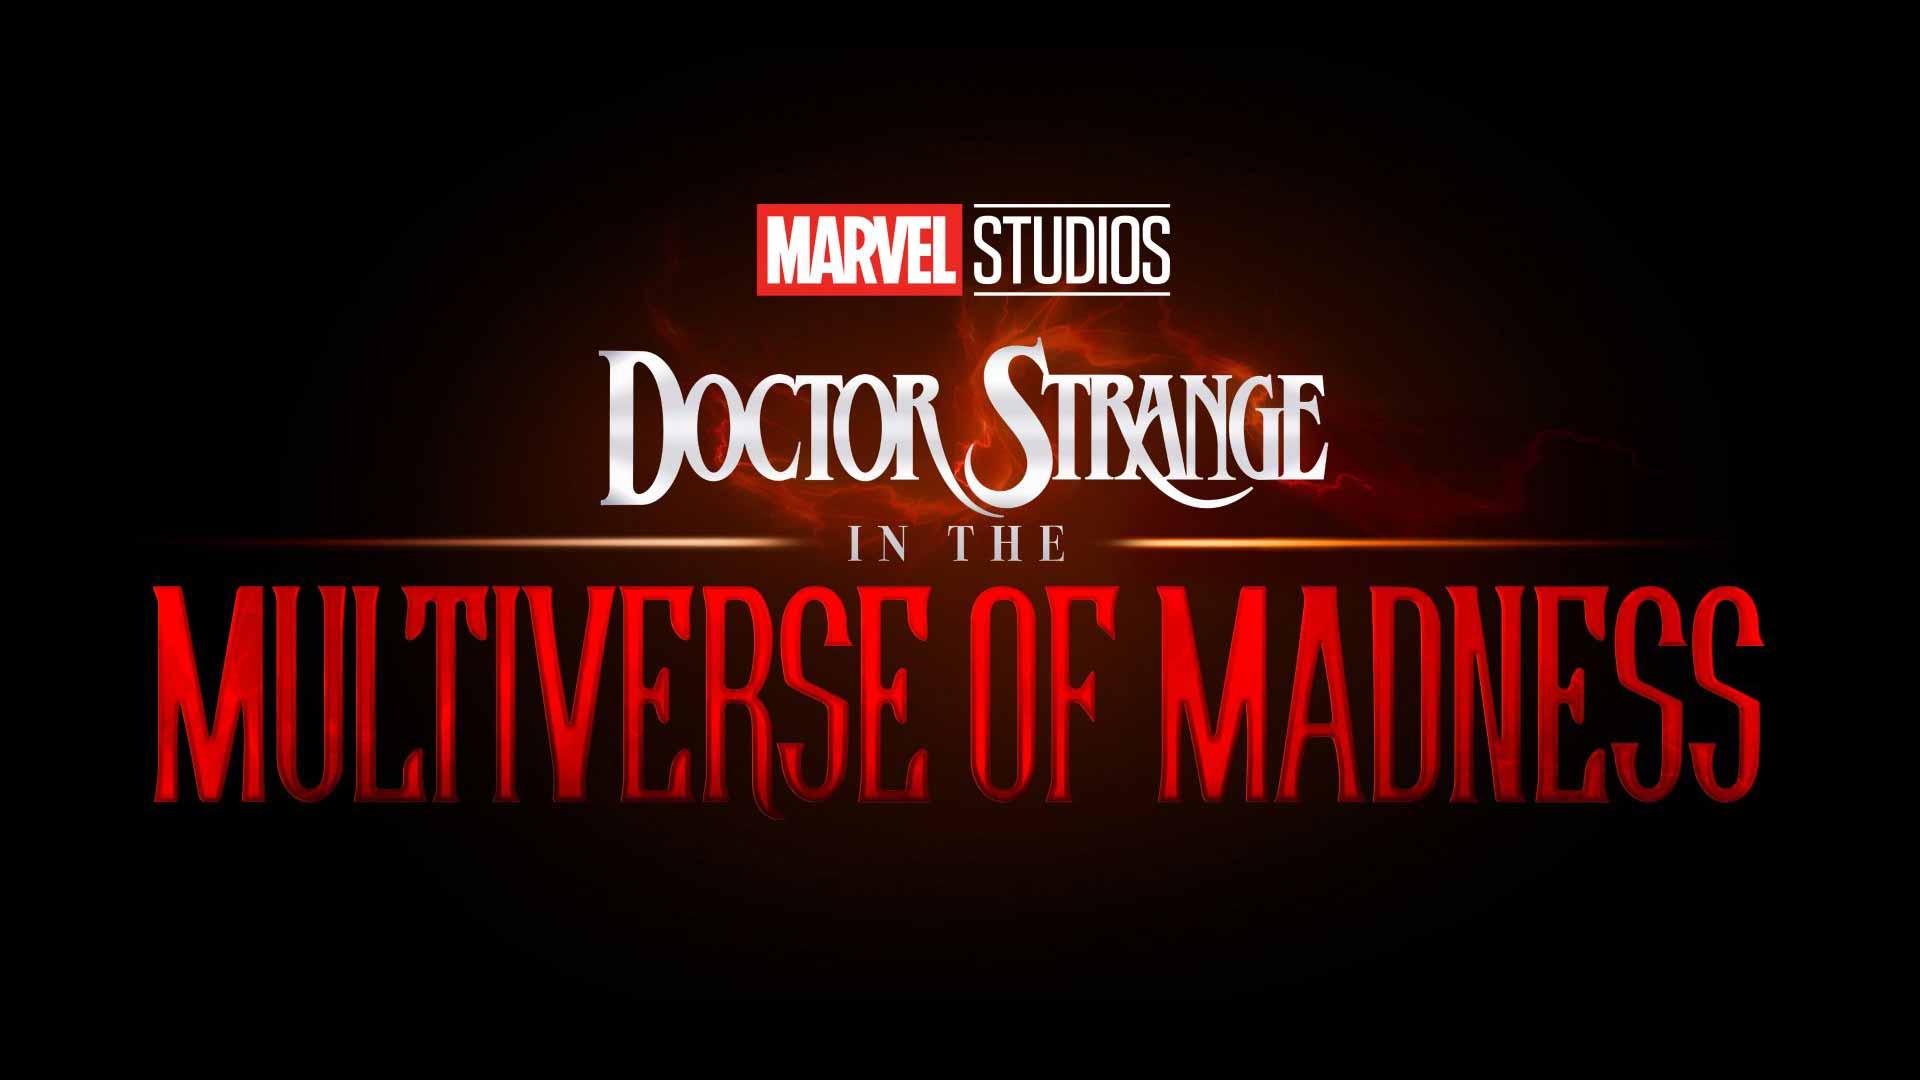 Doctor strange 2 marvel black logo